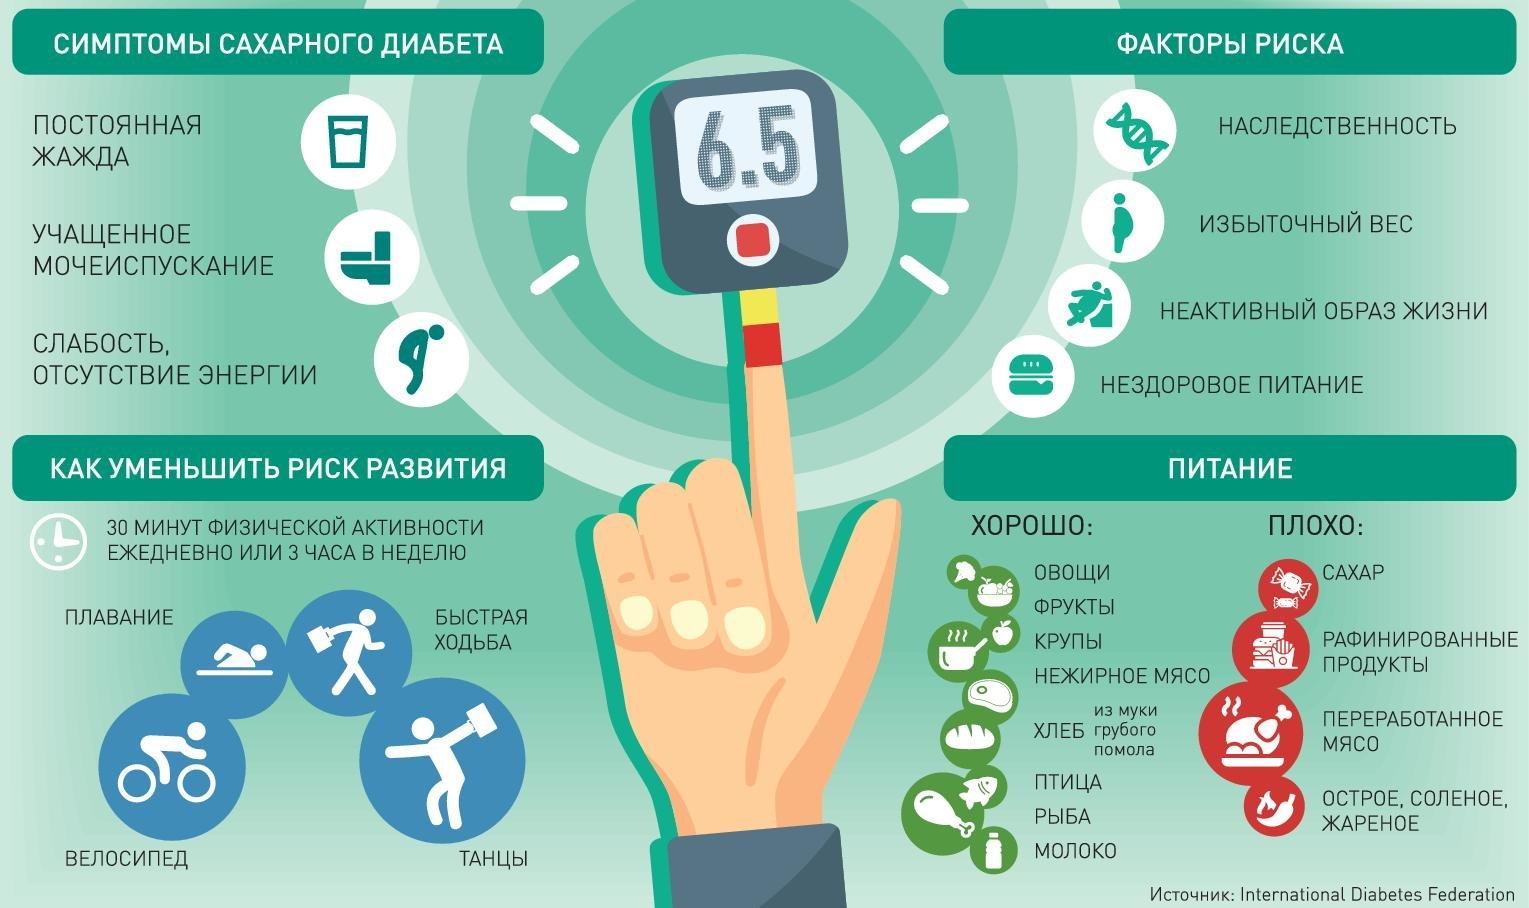 Профилактика сахарного диабета 1 и 2 типа: памятка, рекомендации